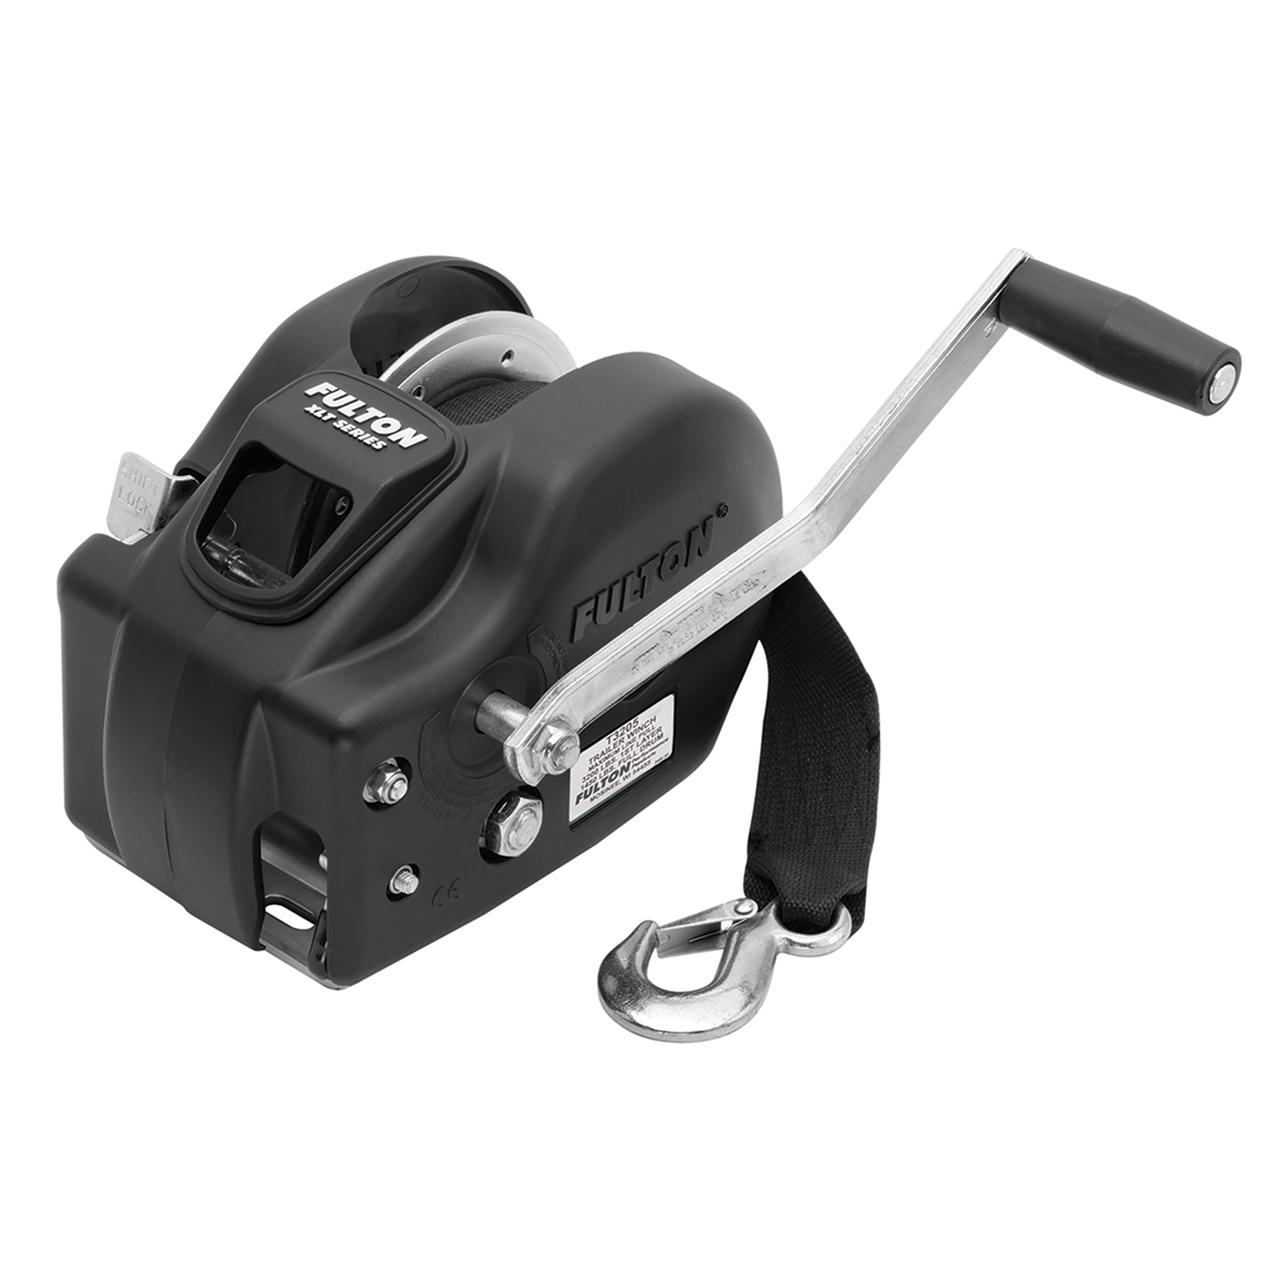 New Fulton F2 Trailer Winch 3,200 lbs 2-Speed w//Strap